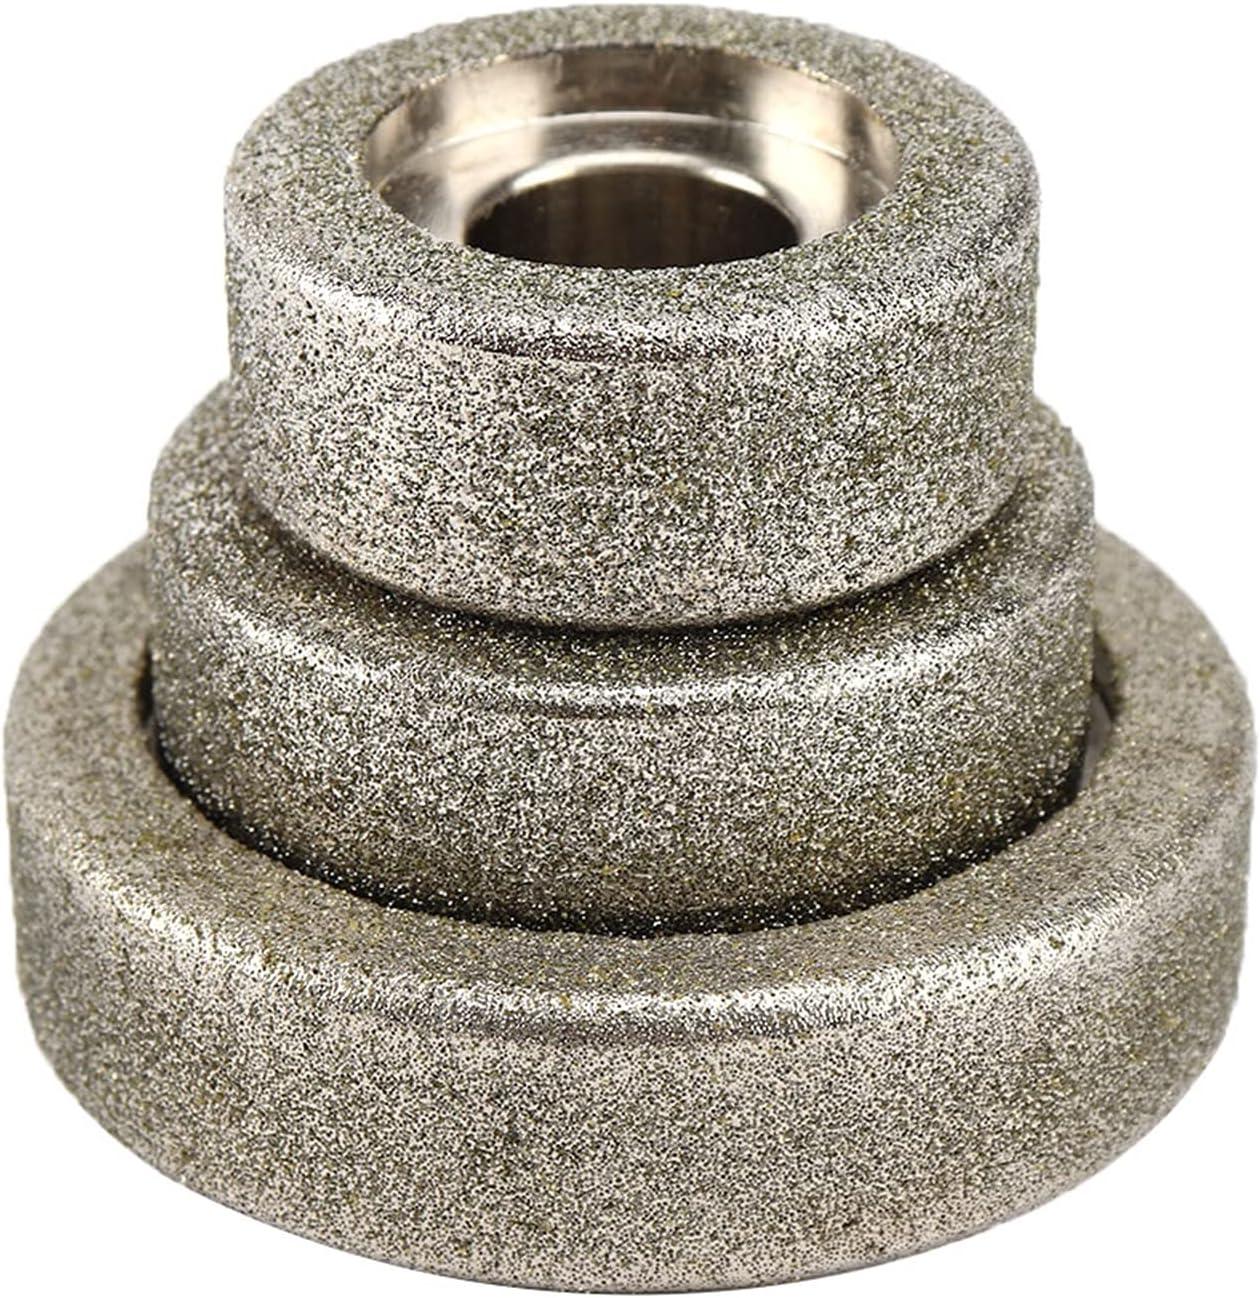 Ranking TOP2 WYDMBH Cutting wheele 50 60 80mm Grinding Wheel G Circle Diamond Regular store